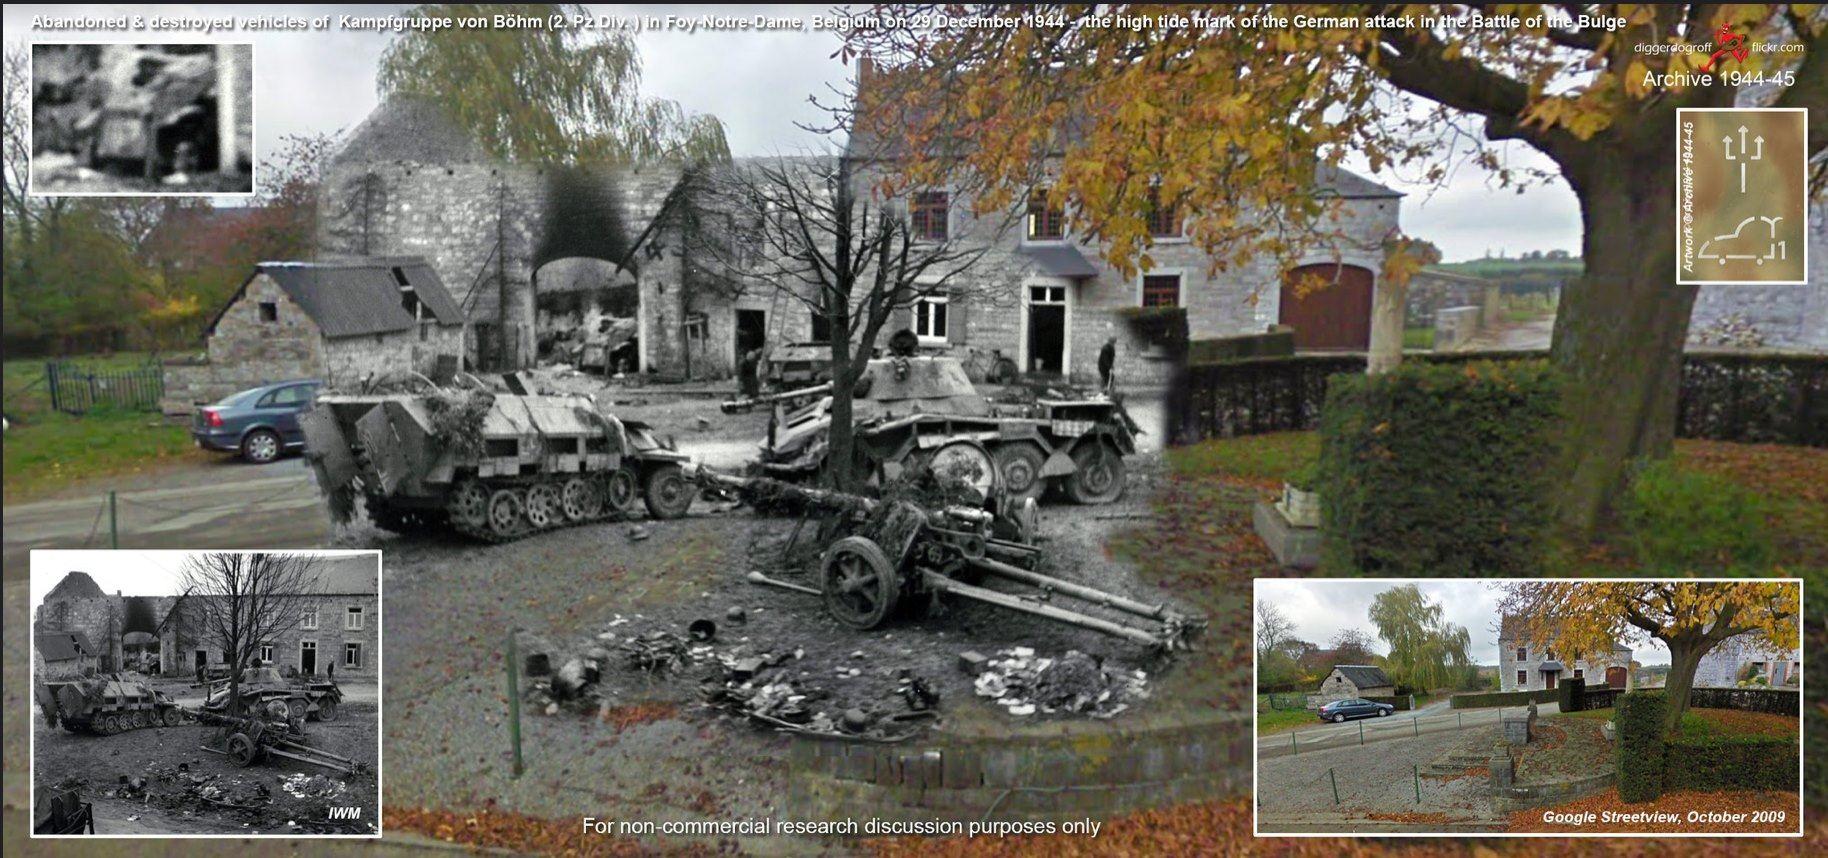 Battle of Foy-Notre-Dame